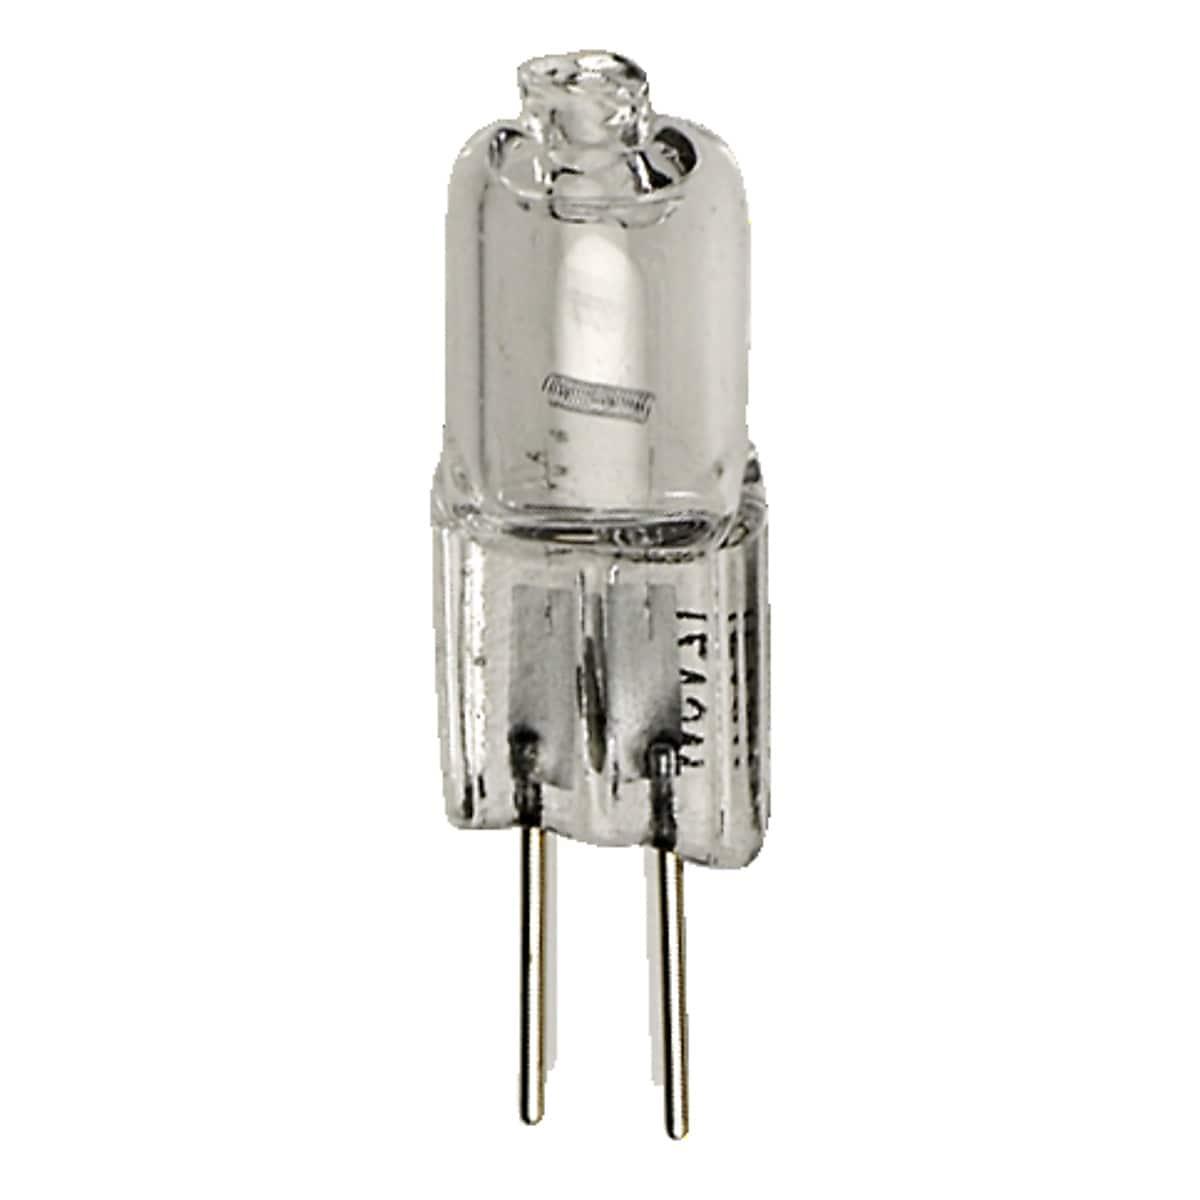 Halogenlampa 6 V G4, 2-pack